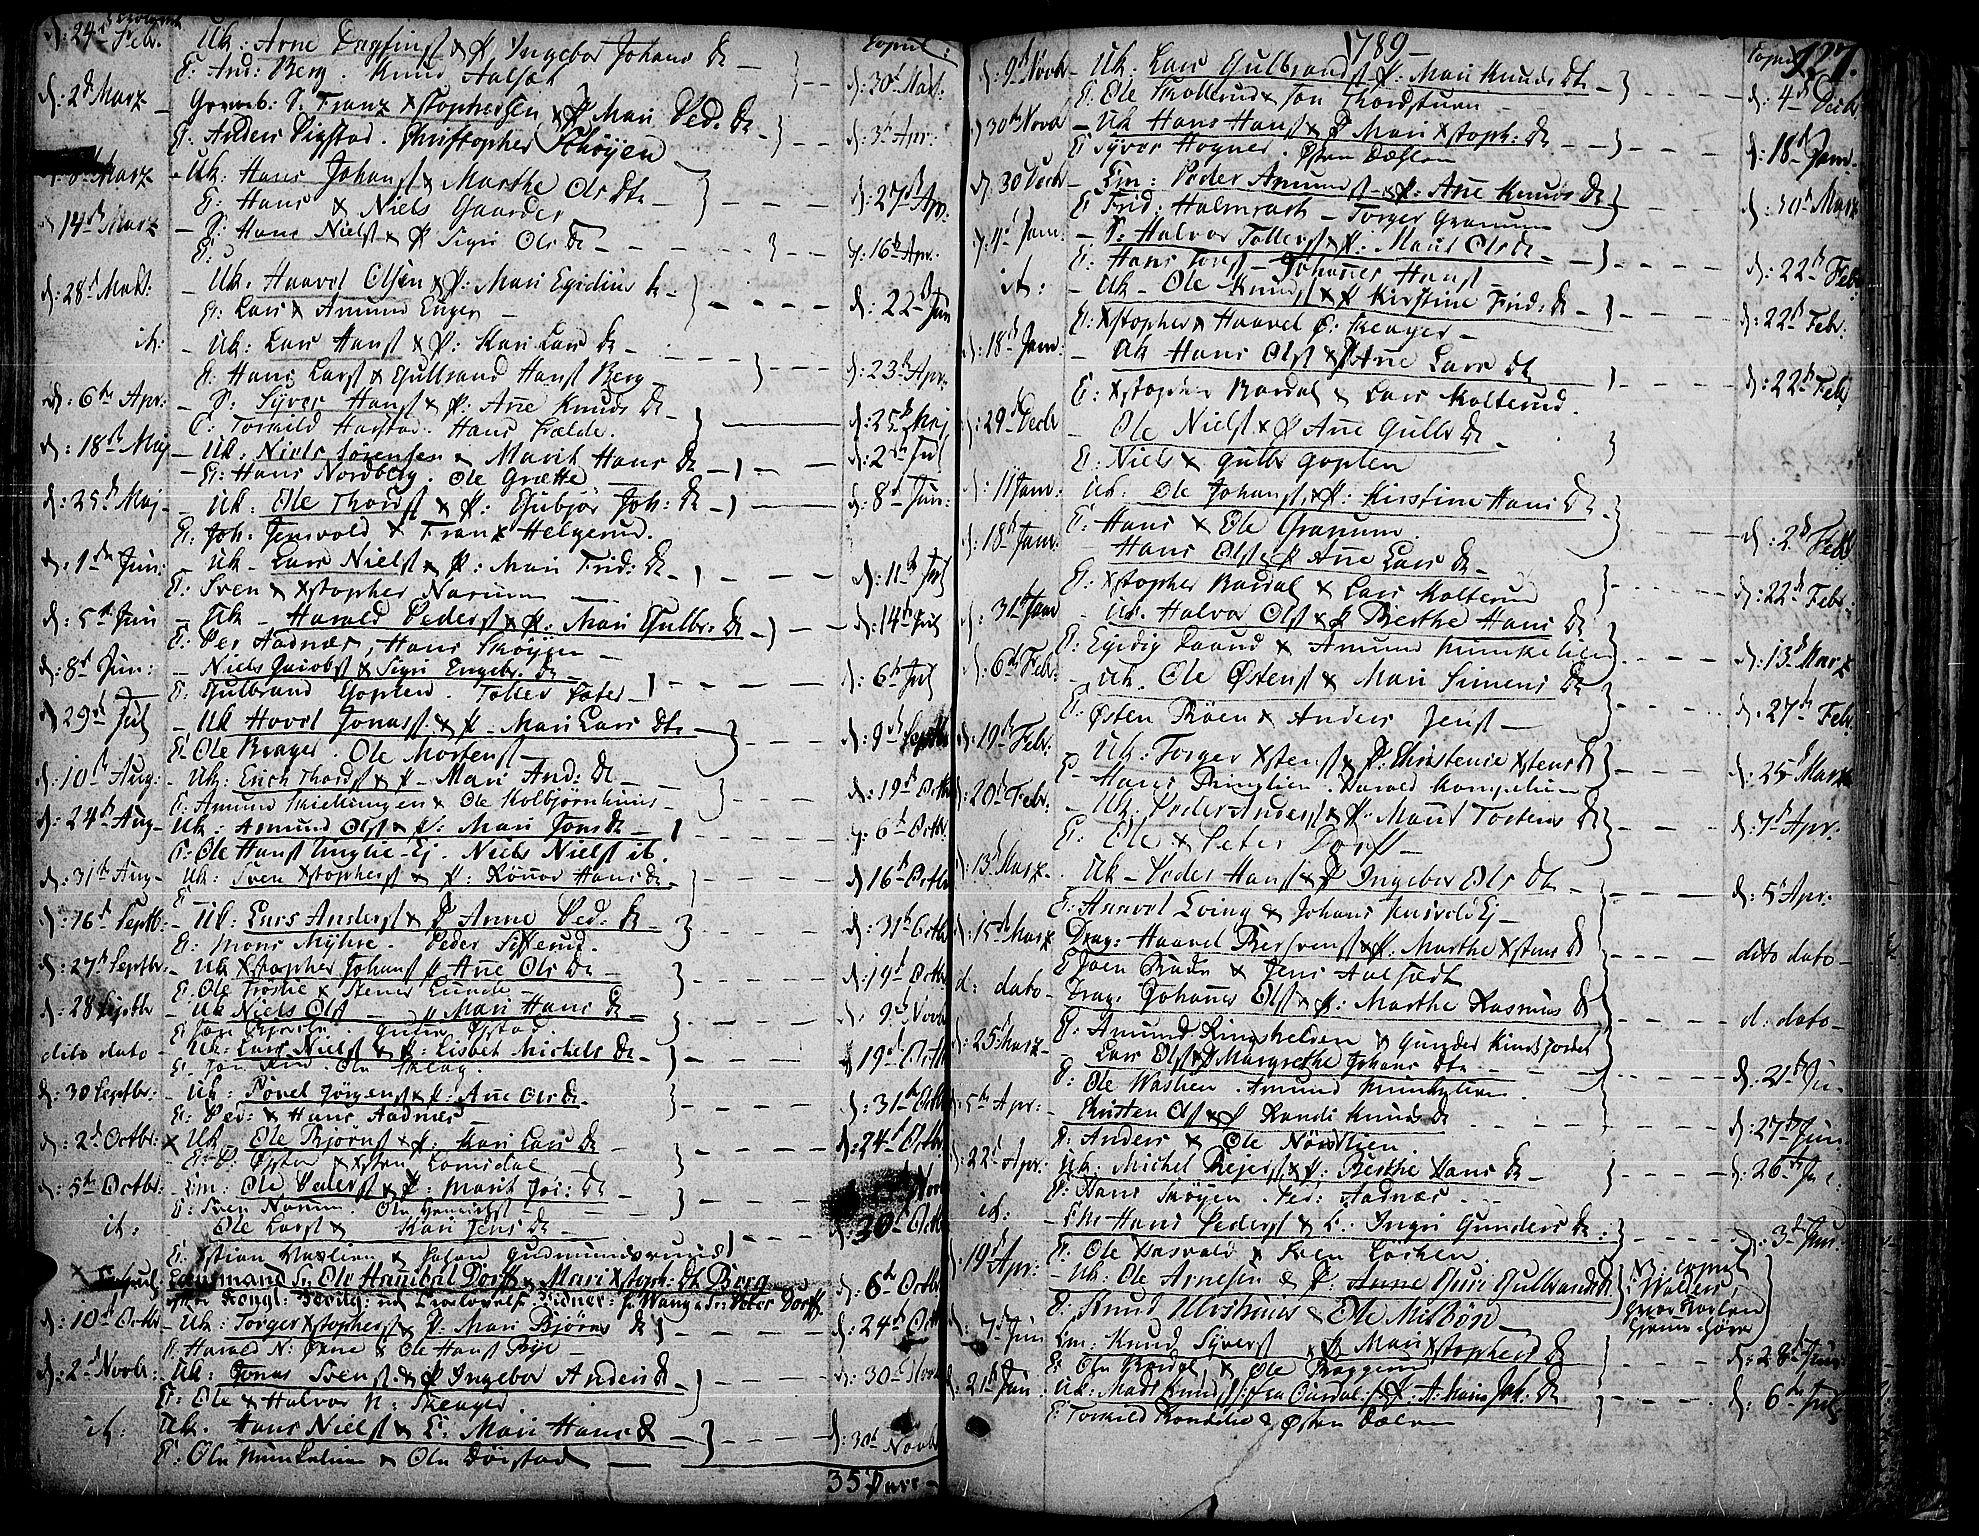 SAH, Land prestekontor, Ministerialbok nr. 6, 1784-1813, s. 127